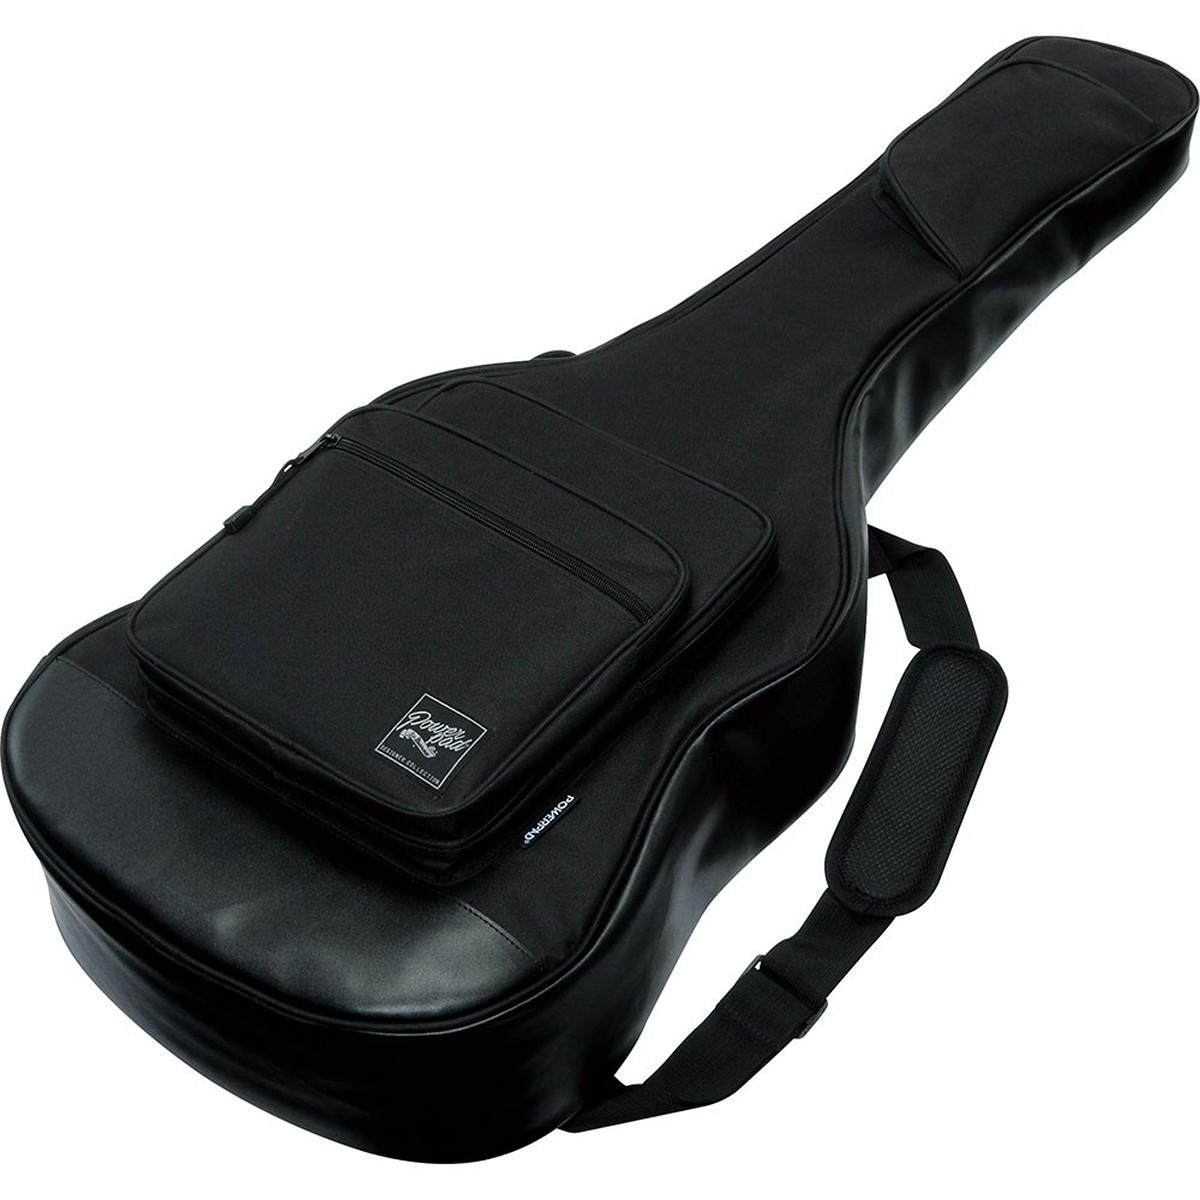 IBANEZ ICB540-BK BLACK - BORSA PER CHITRARRA CLASSICA